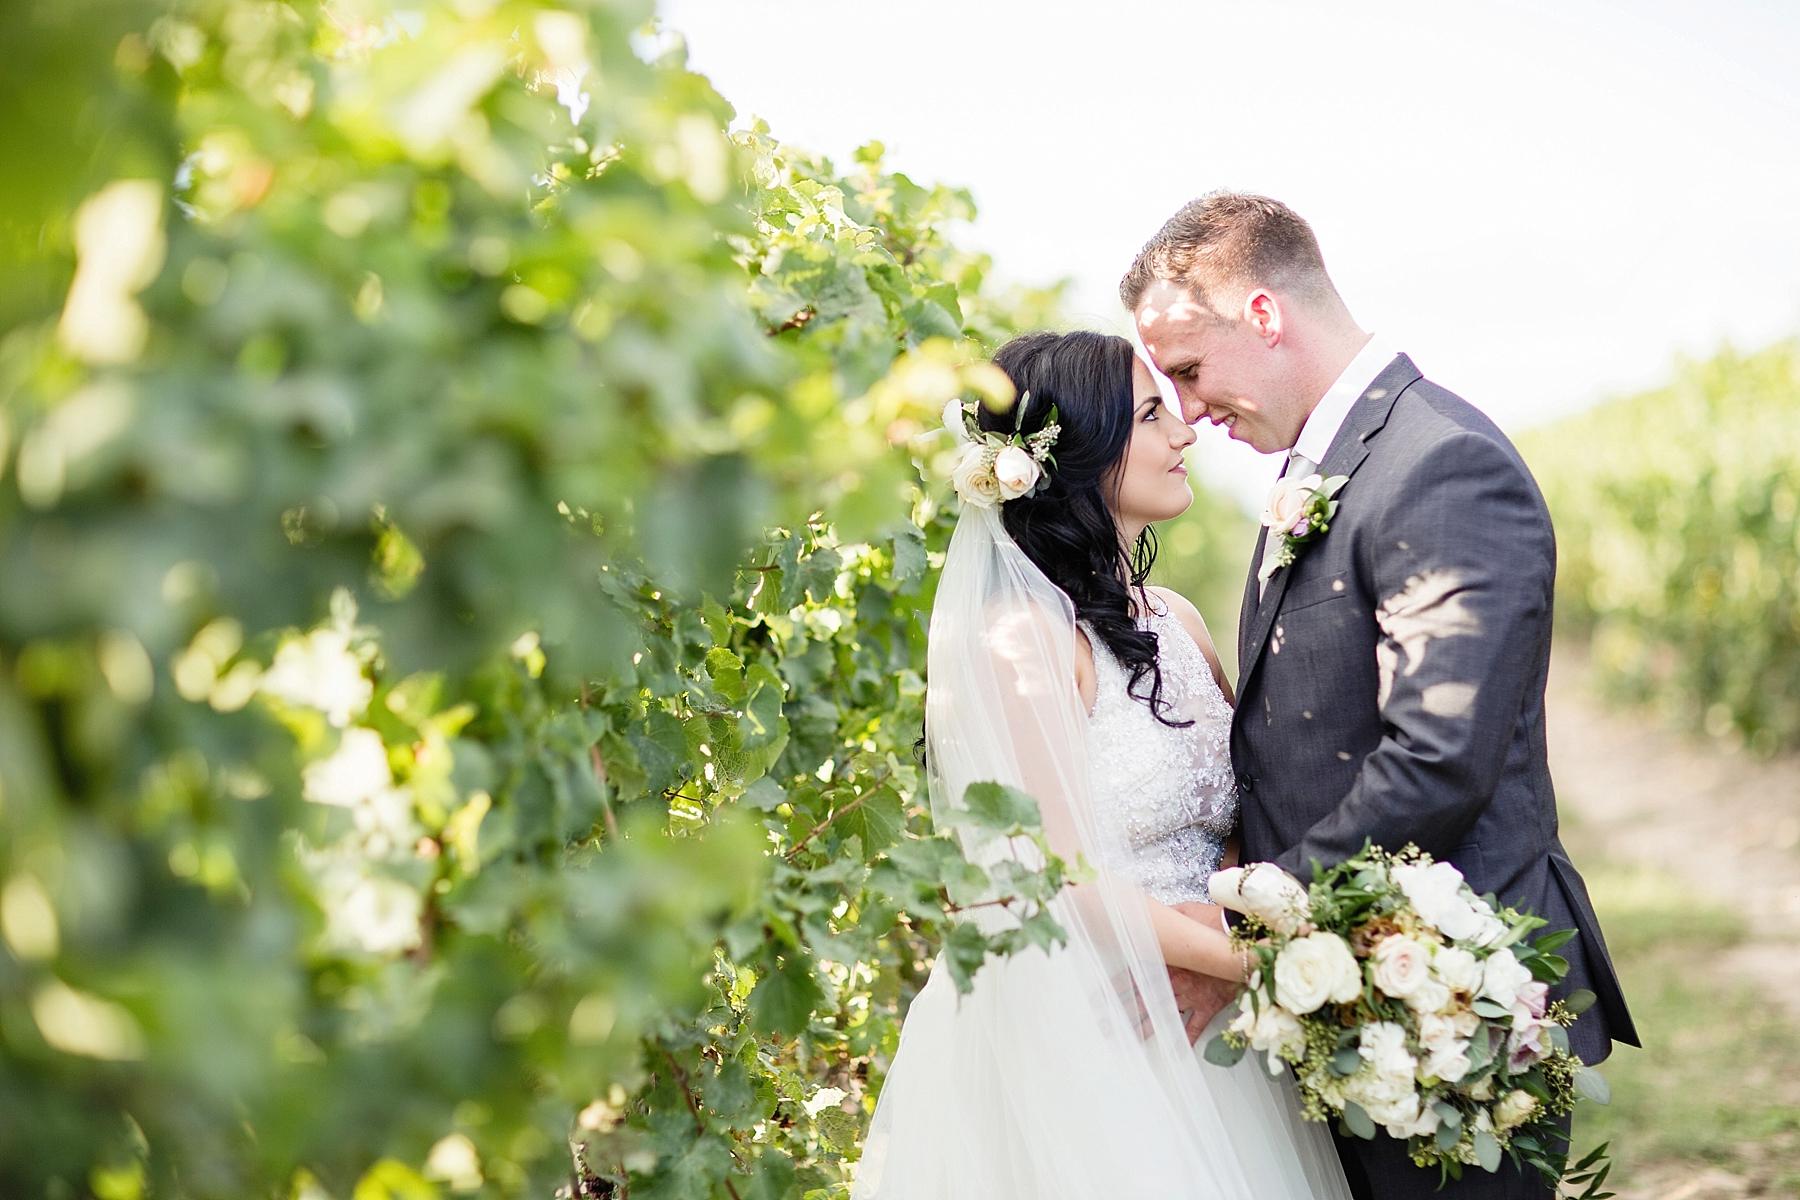 windsor-wedding-photographer-sprucewood-shores-winery-wedding-niagara-on-the-lake-wedding-photographer-eryn-shea-photography_0042.jpg